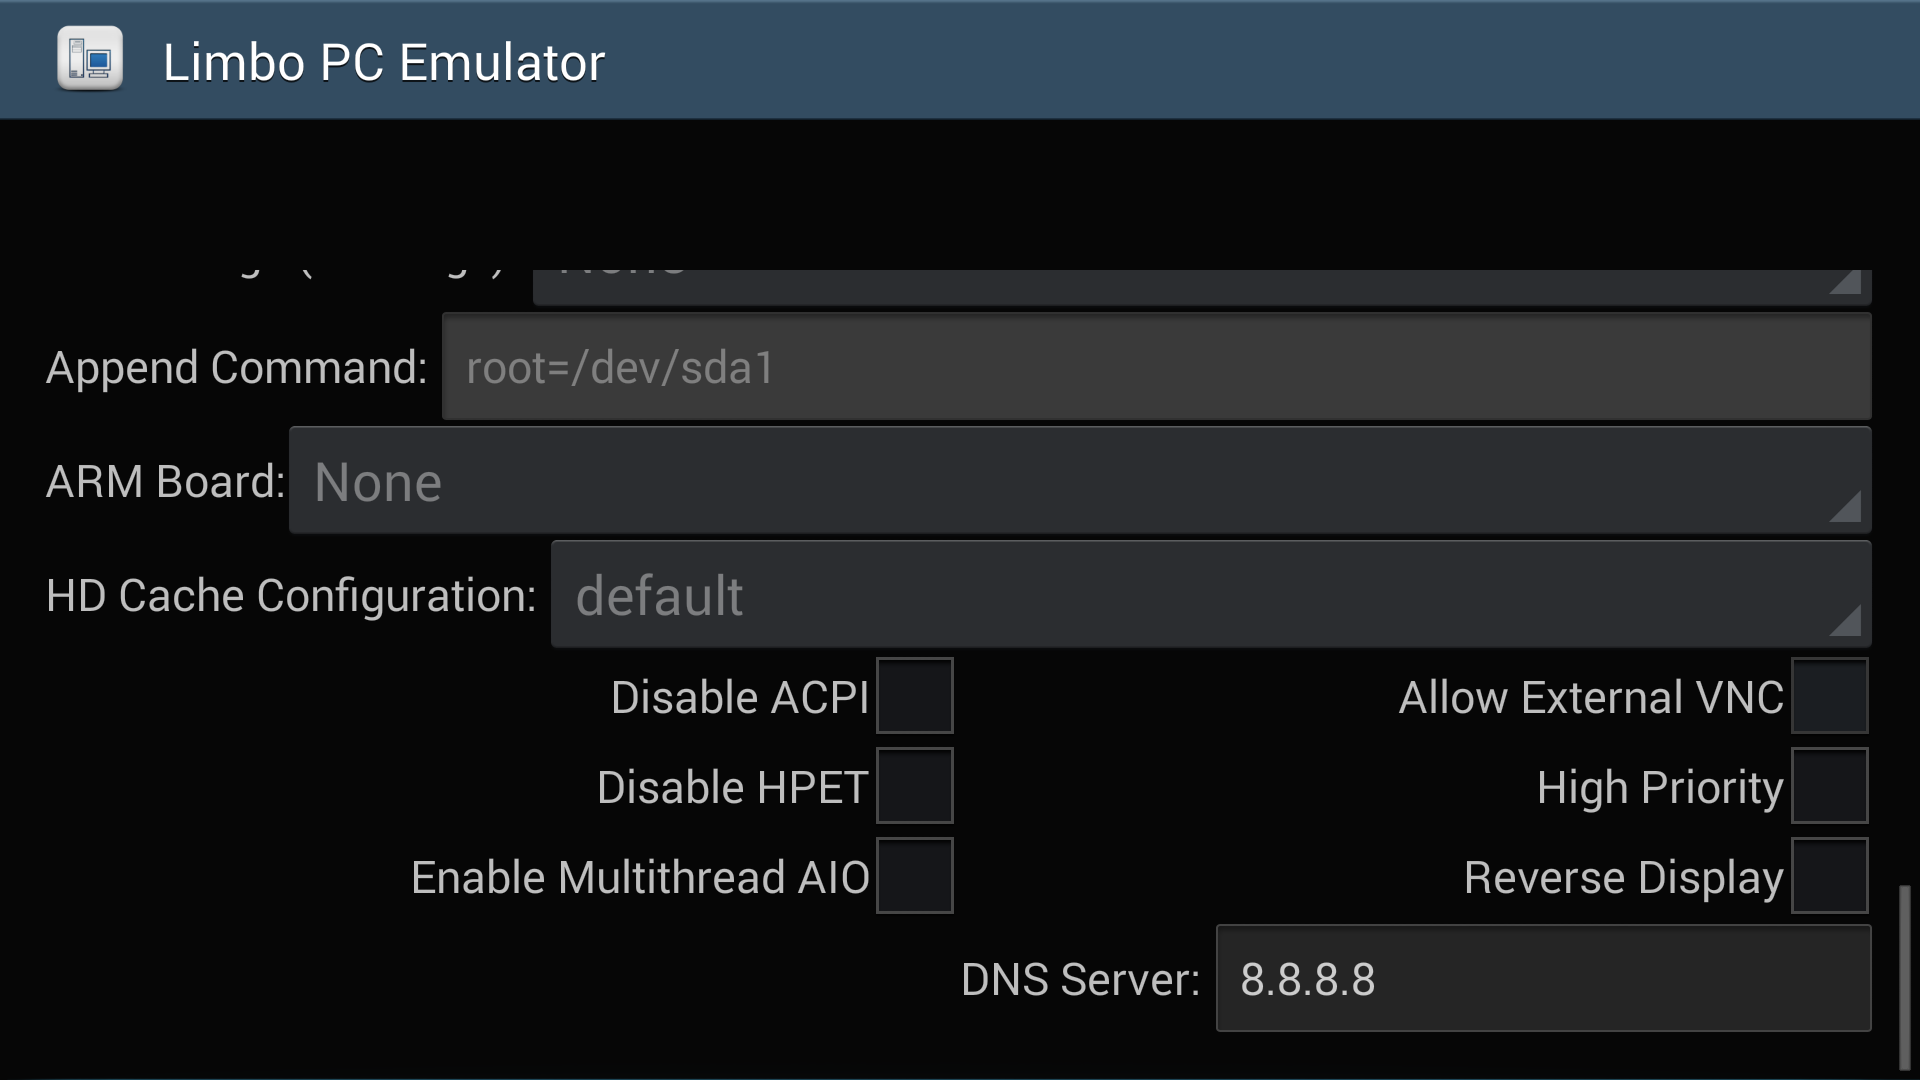 limbo pc emulator kali linux | The Infosec Guru